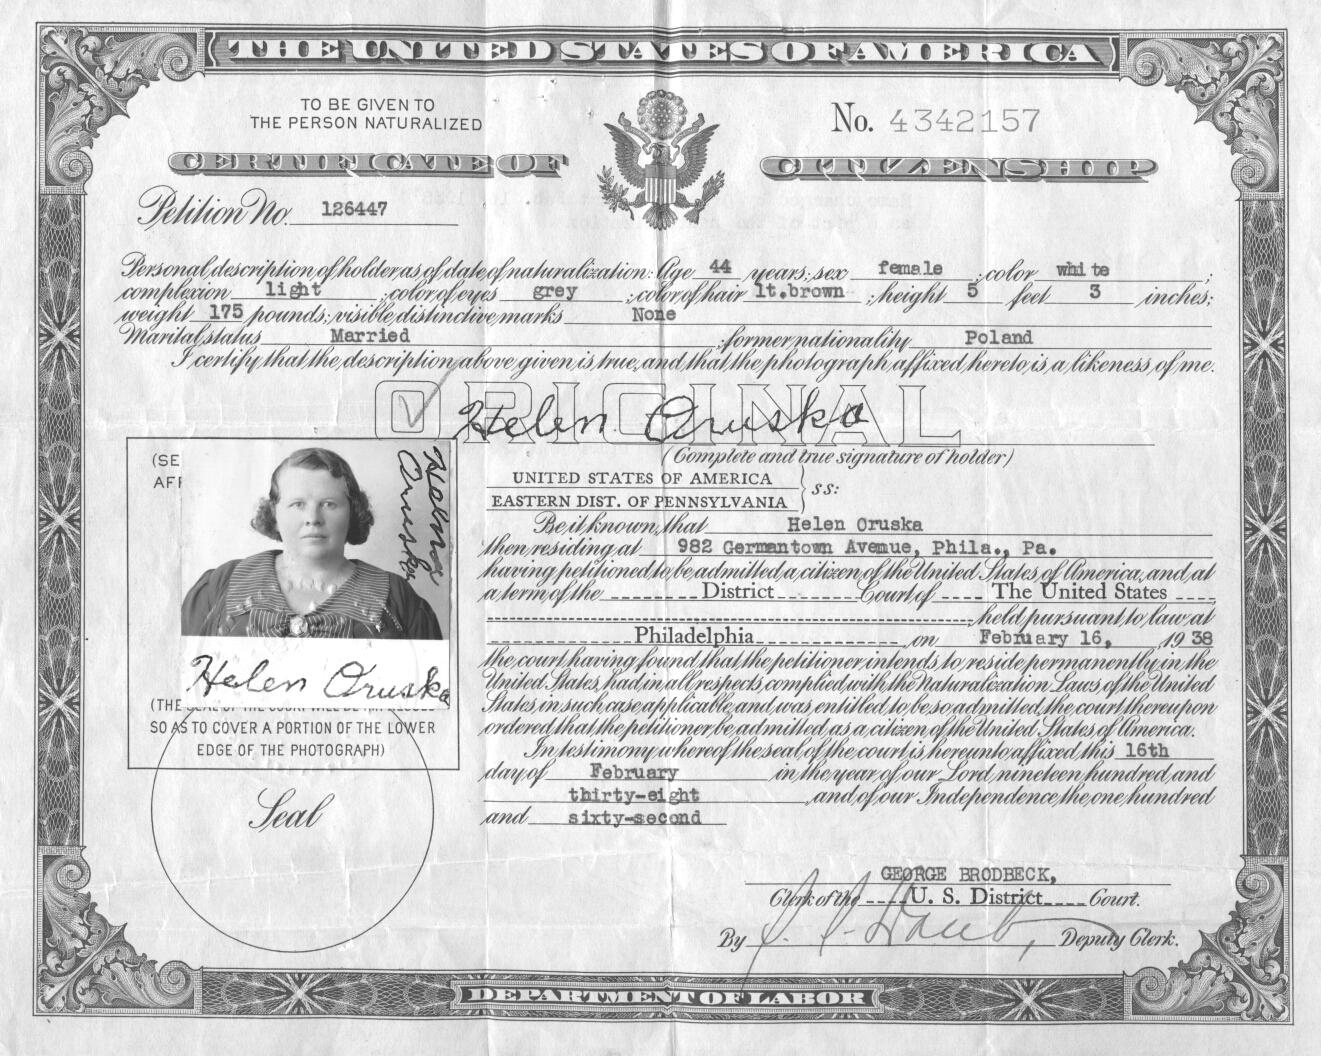 Birth death marriage baptism social security naturalization certificate helen oruska 1betcityfo Choice Image